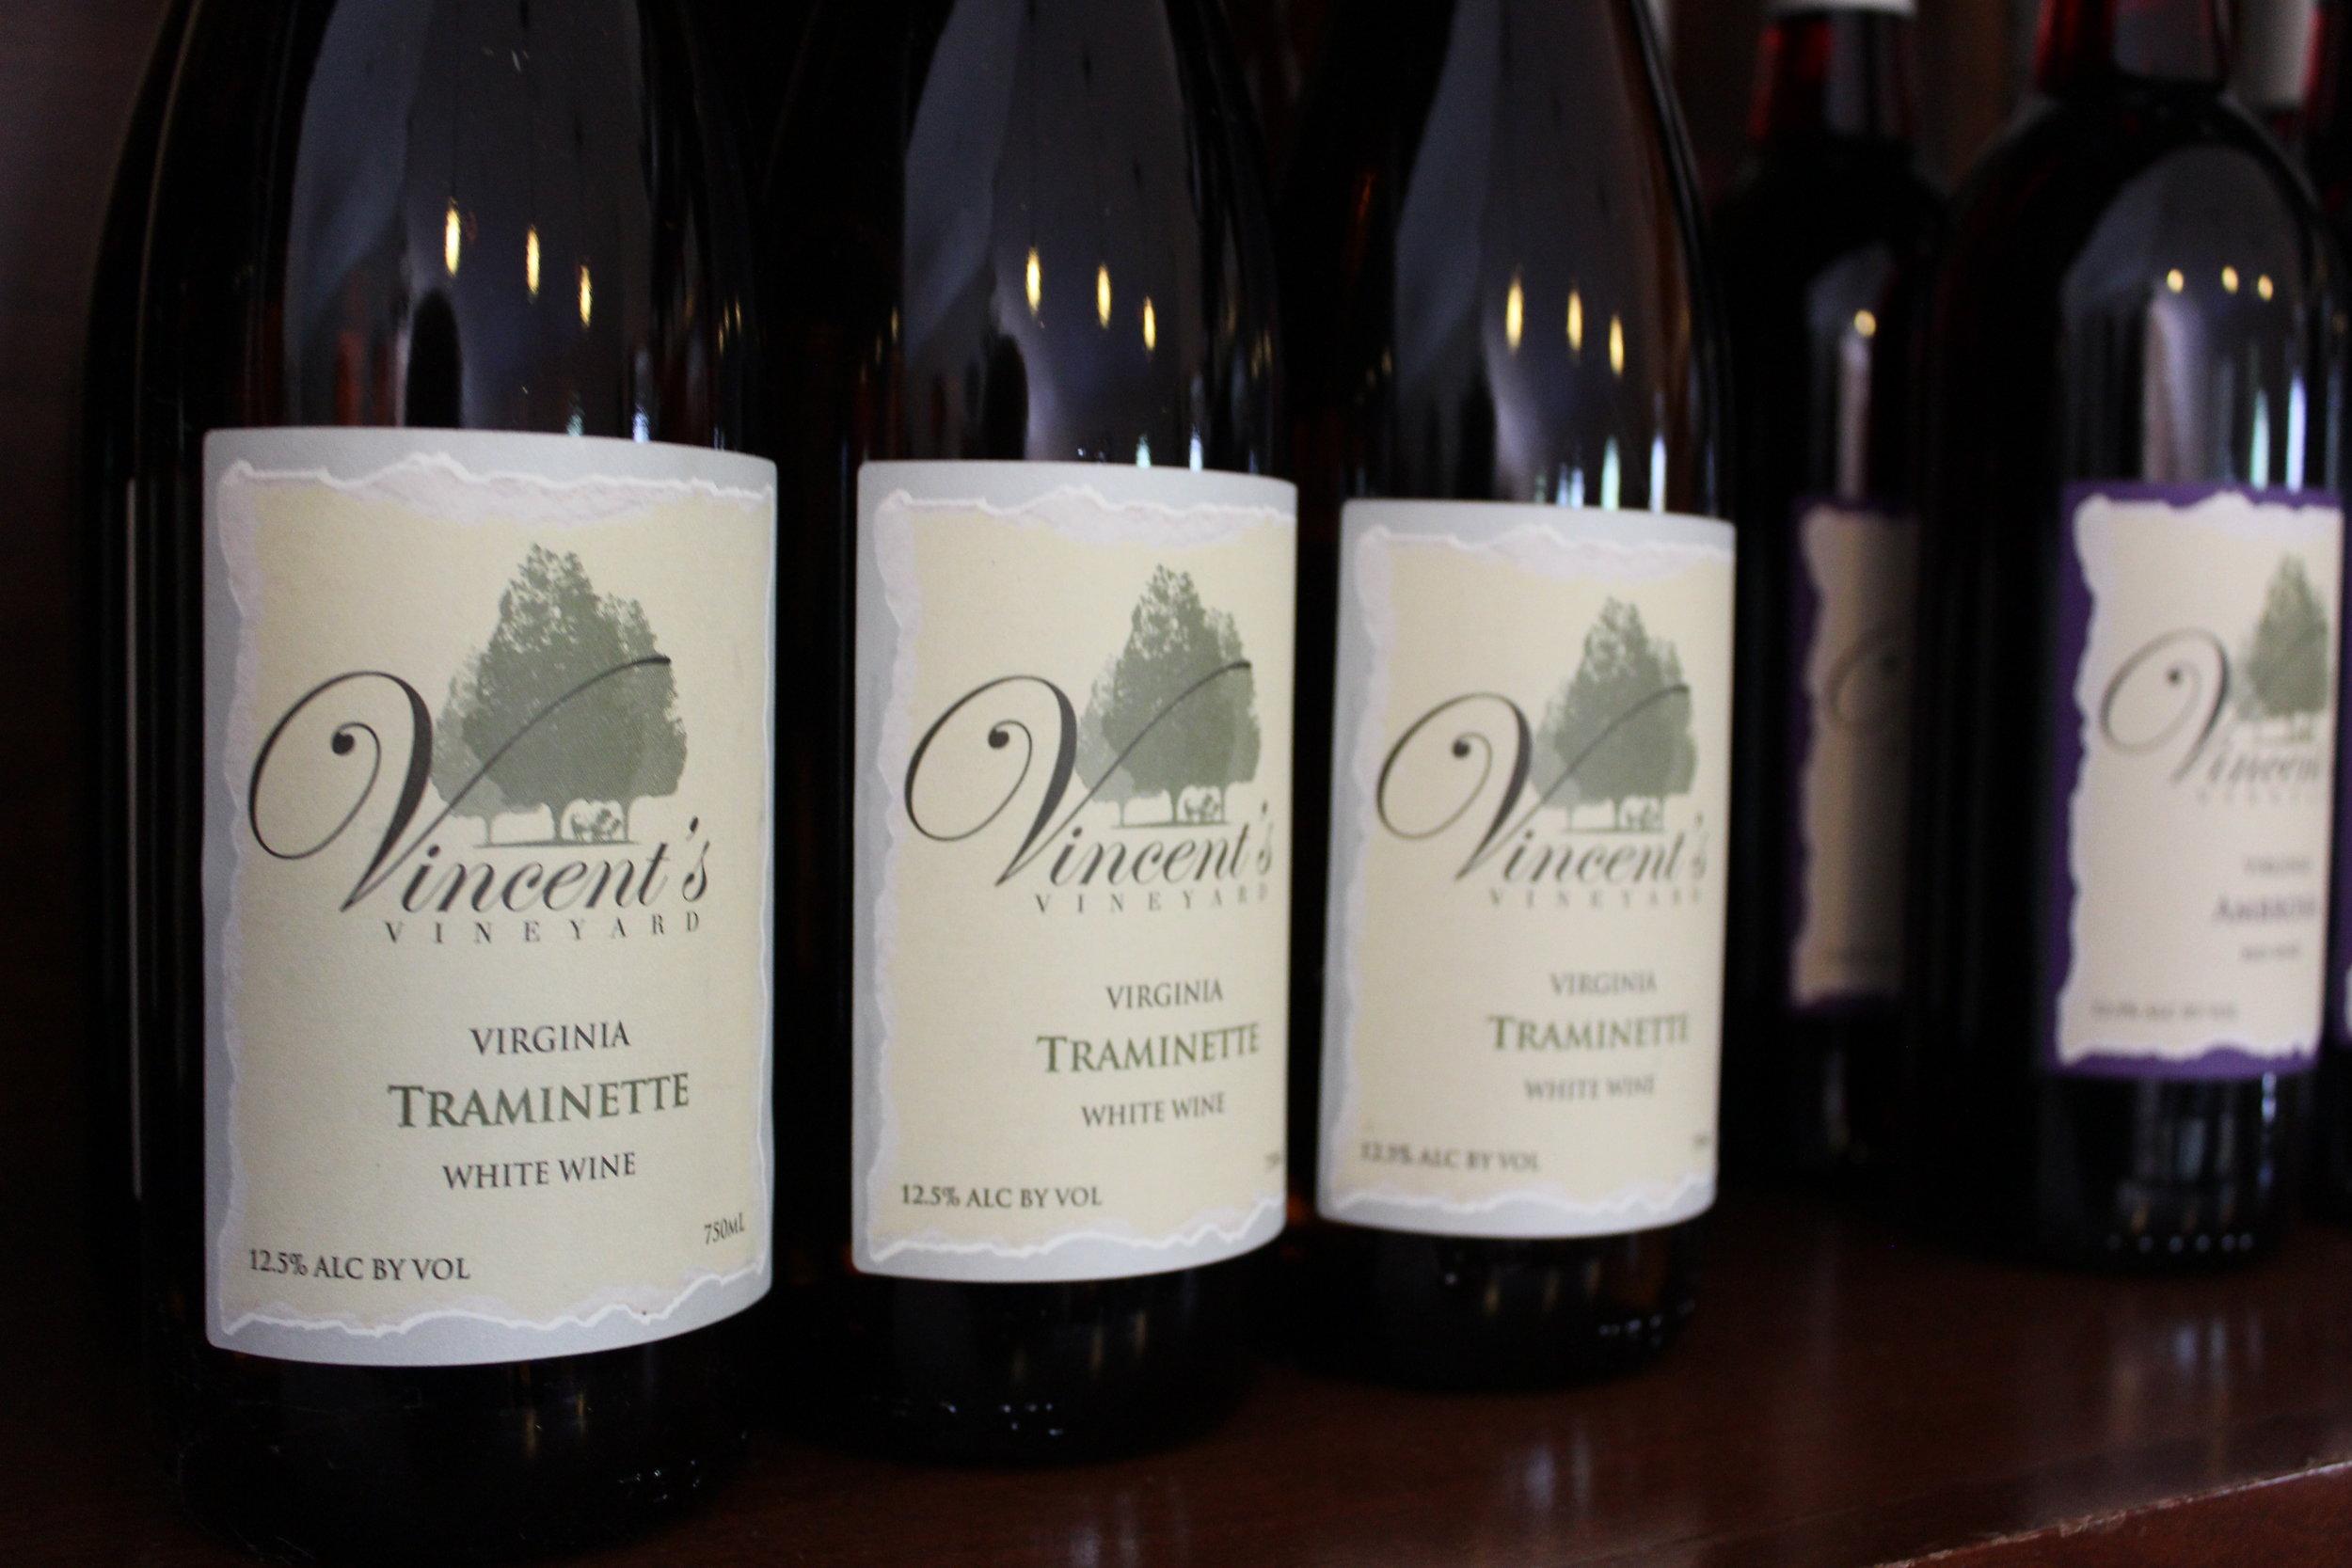 Vincent's Vineyard